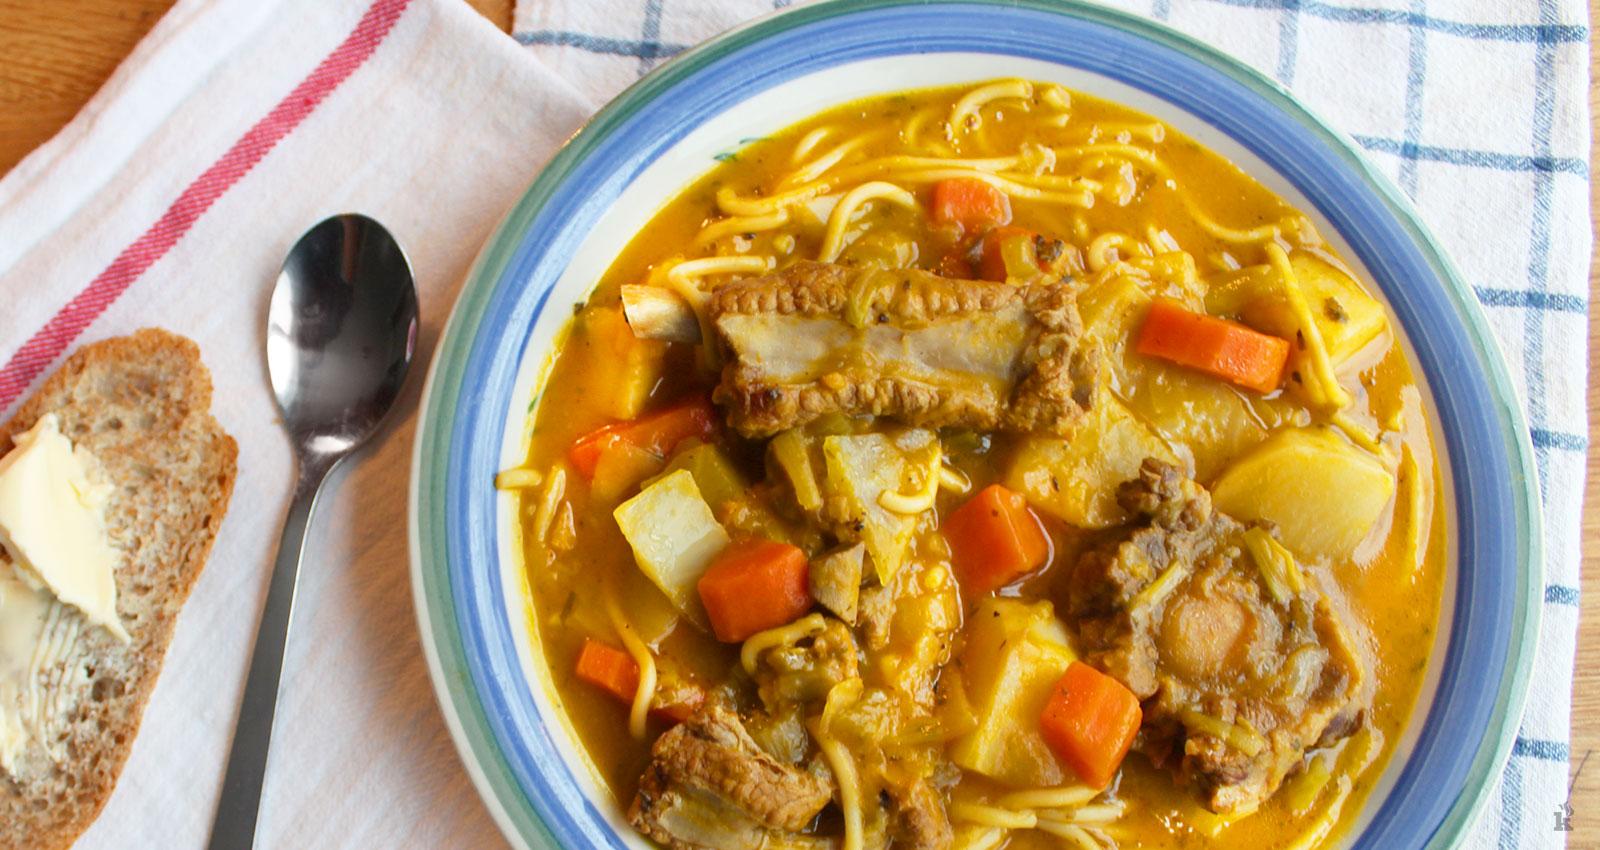 Cuisson de soupe au giraumon. Photo; Kendy Kizin